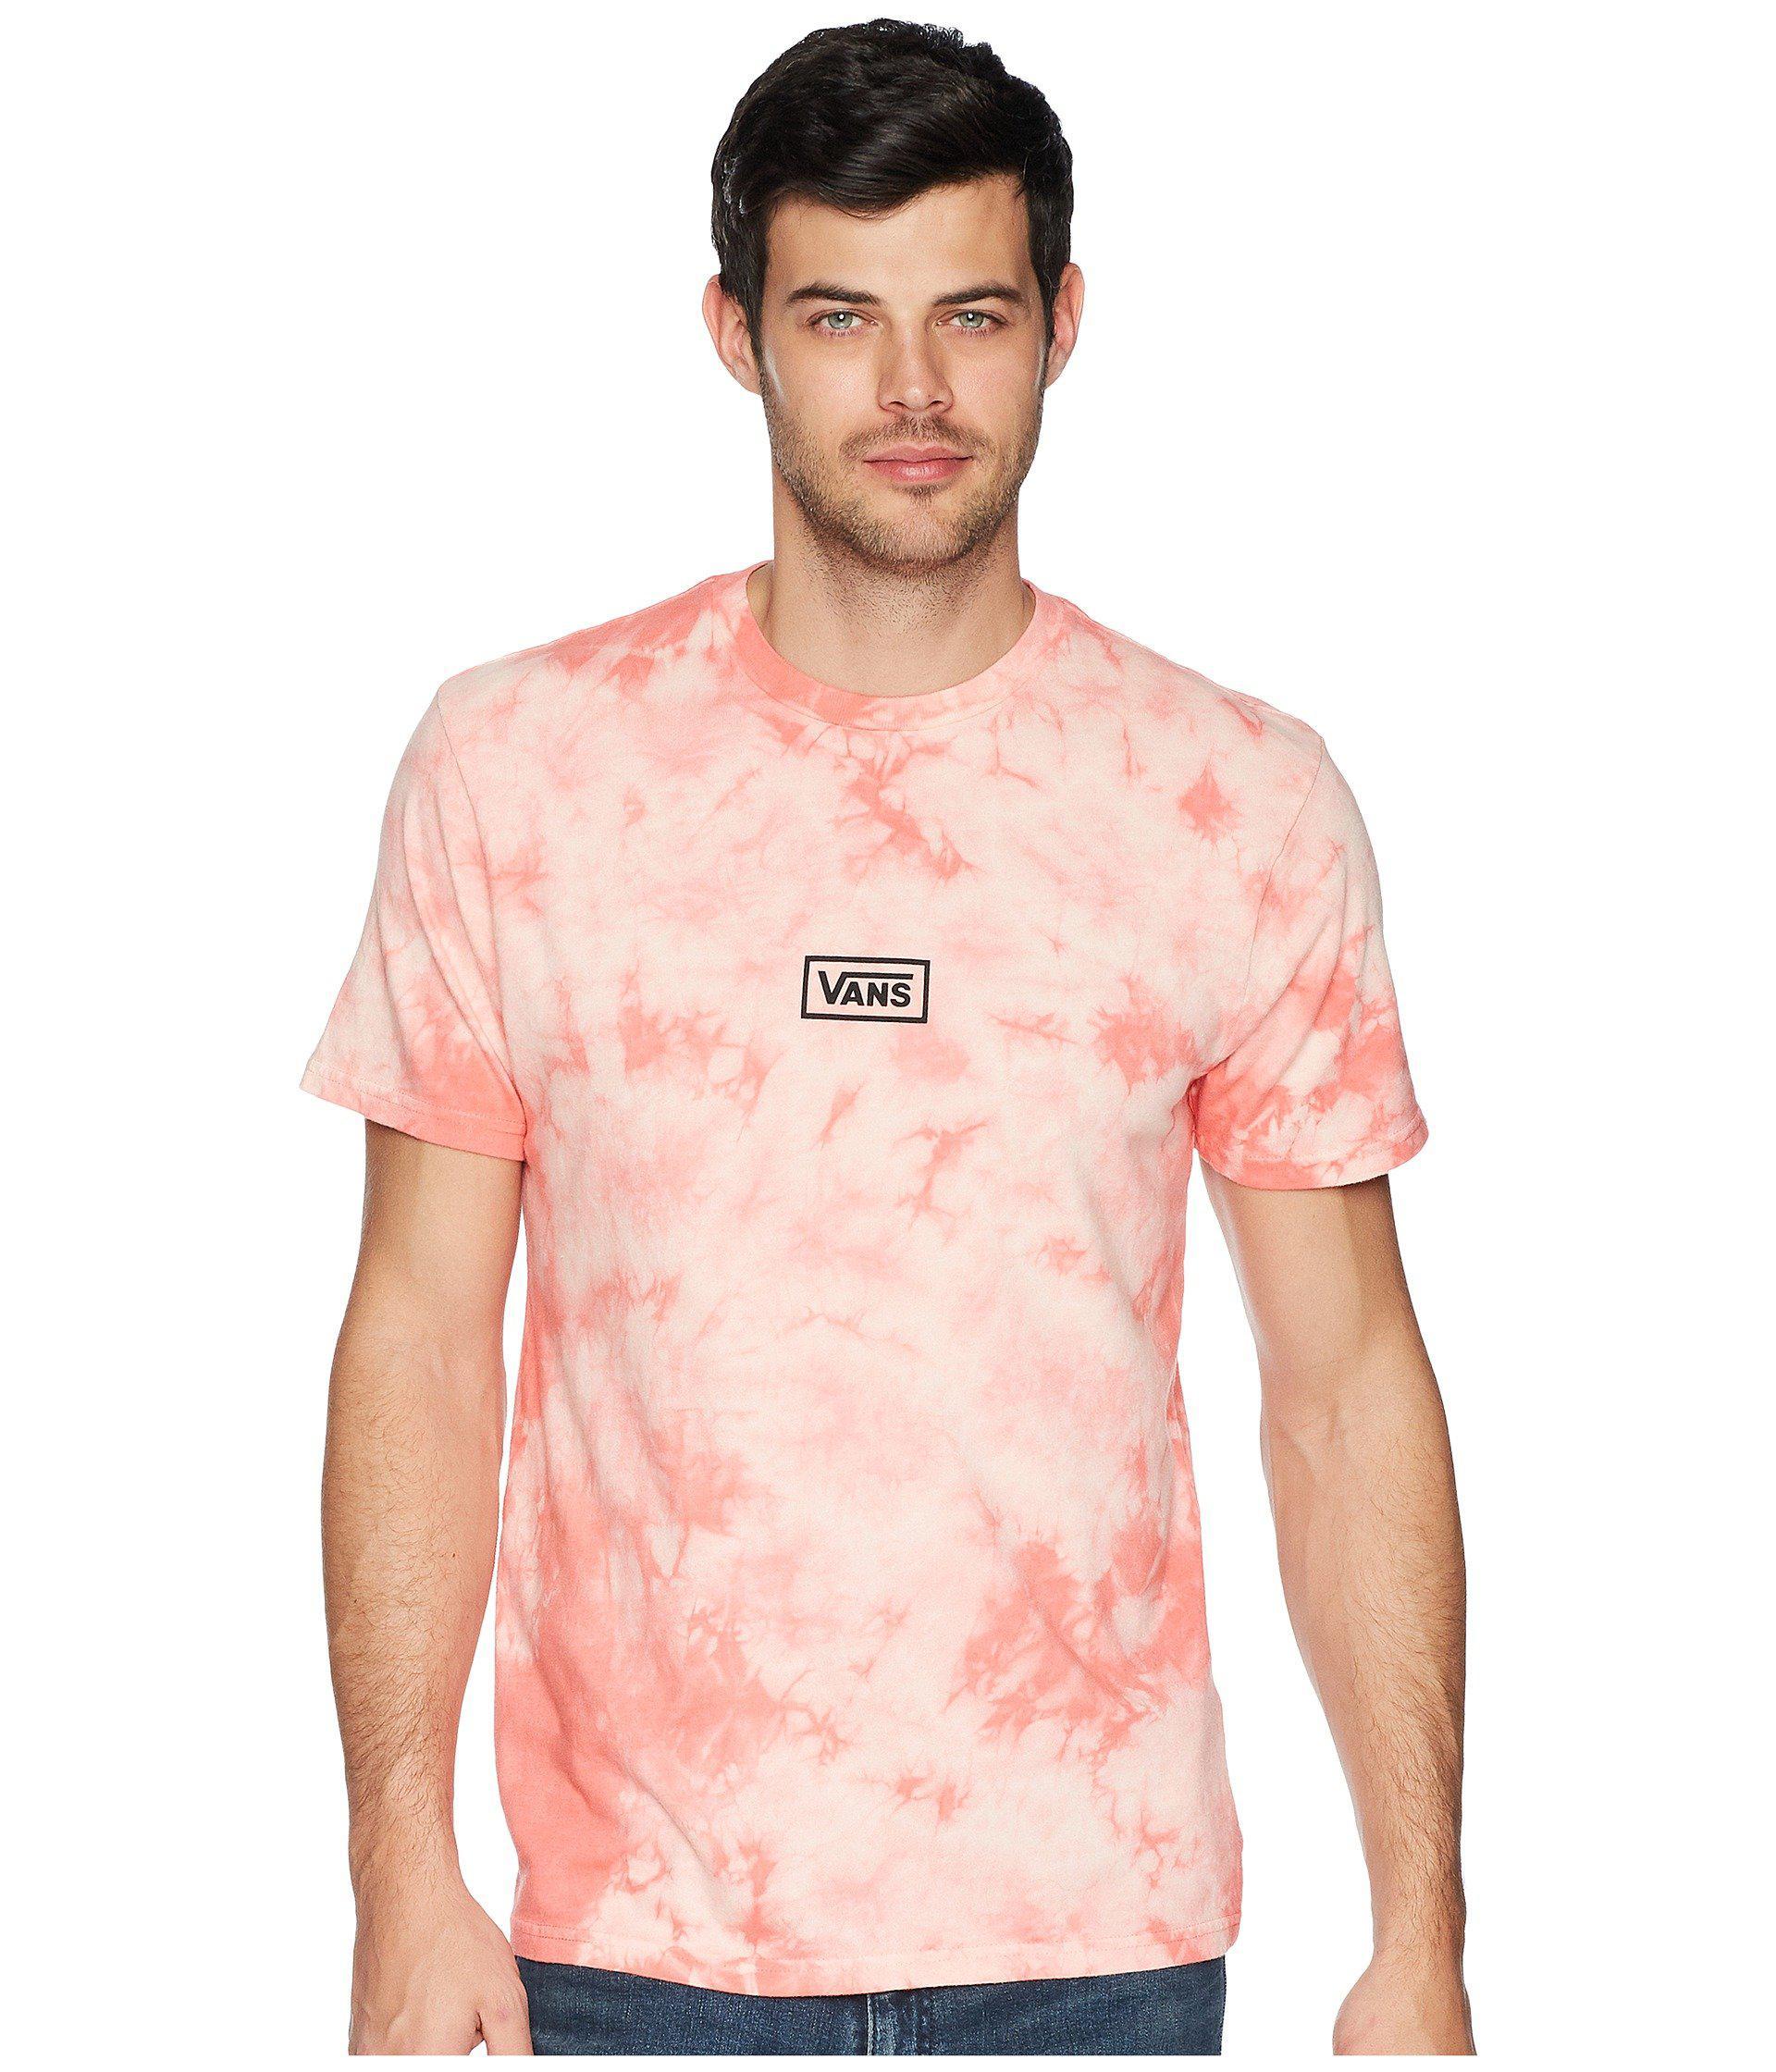 8796ad9b015 Vans - Pink Bleached Out T-shirt for Men - Lyst. View fullscreen